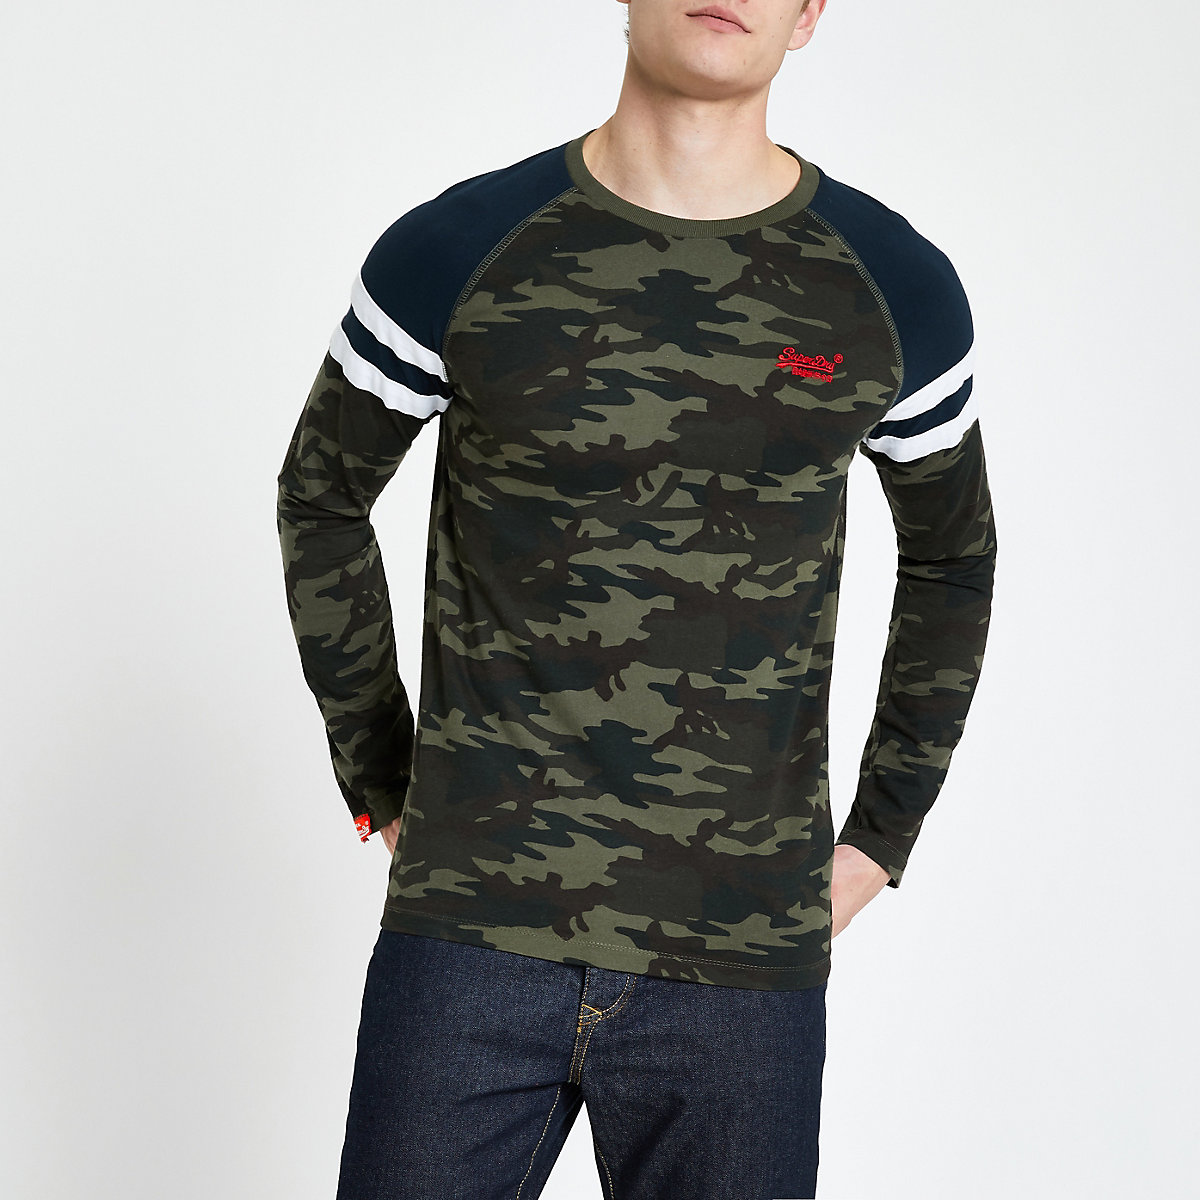 Superdry khaki camo long sleeve T-shirt